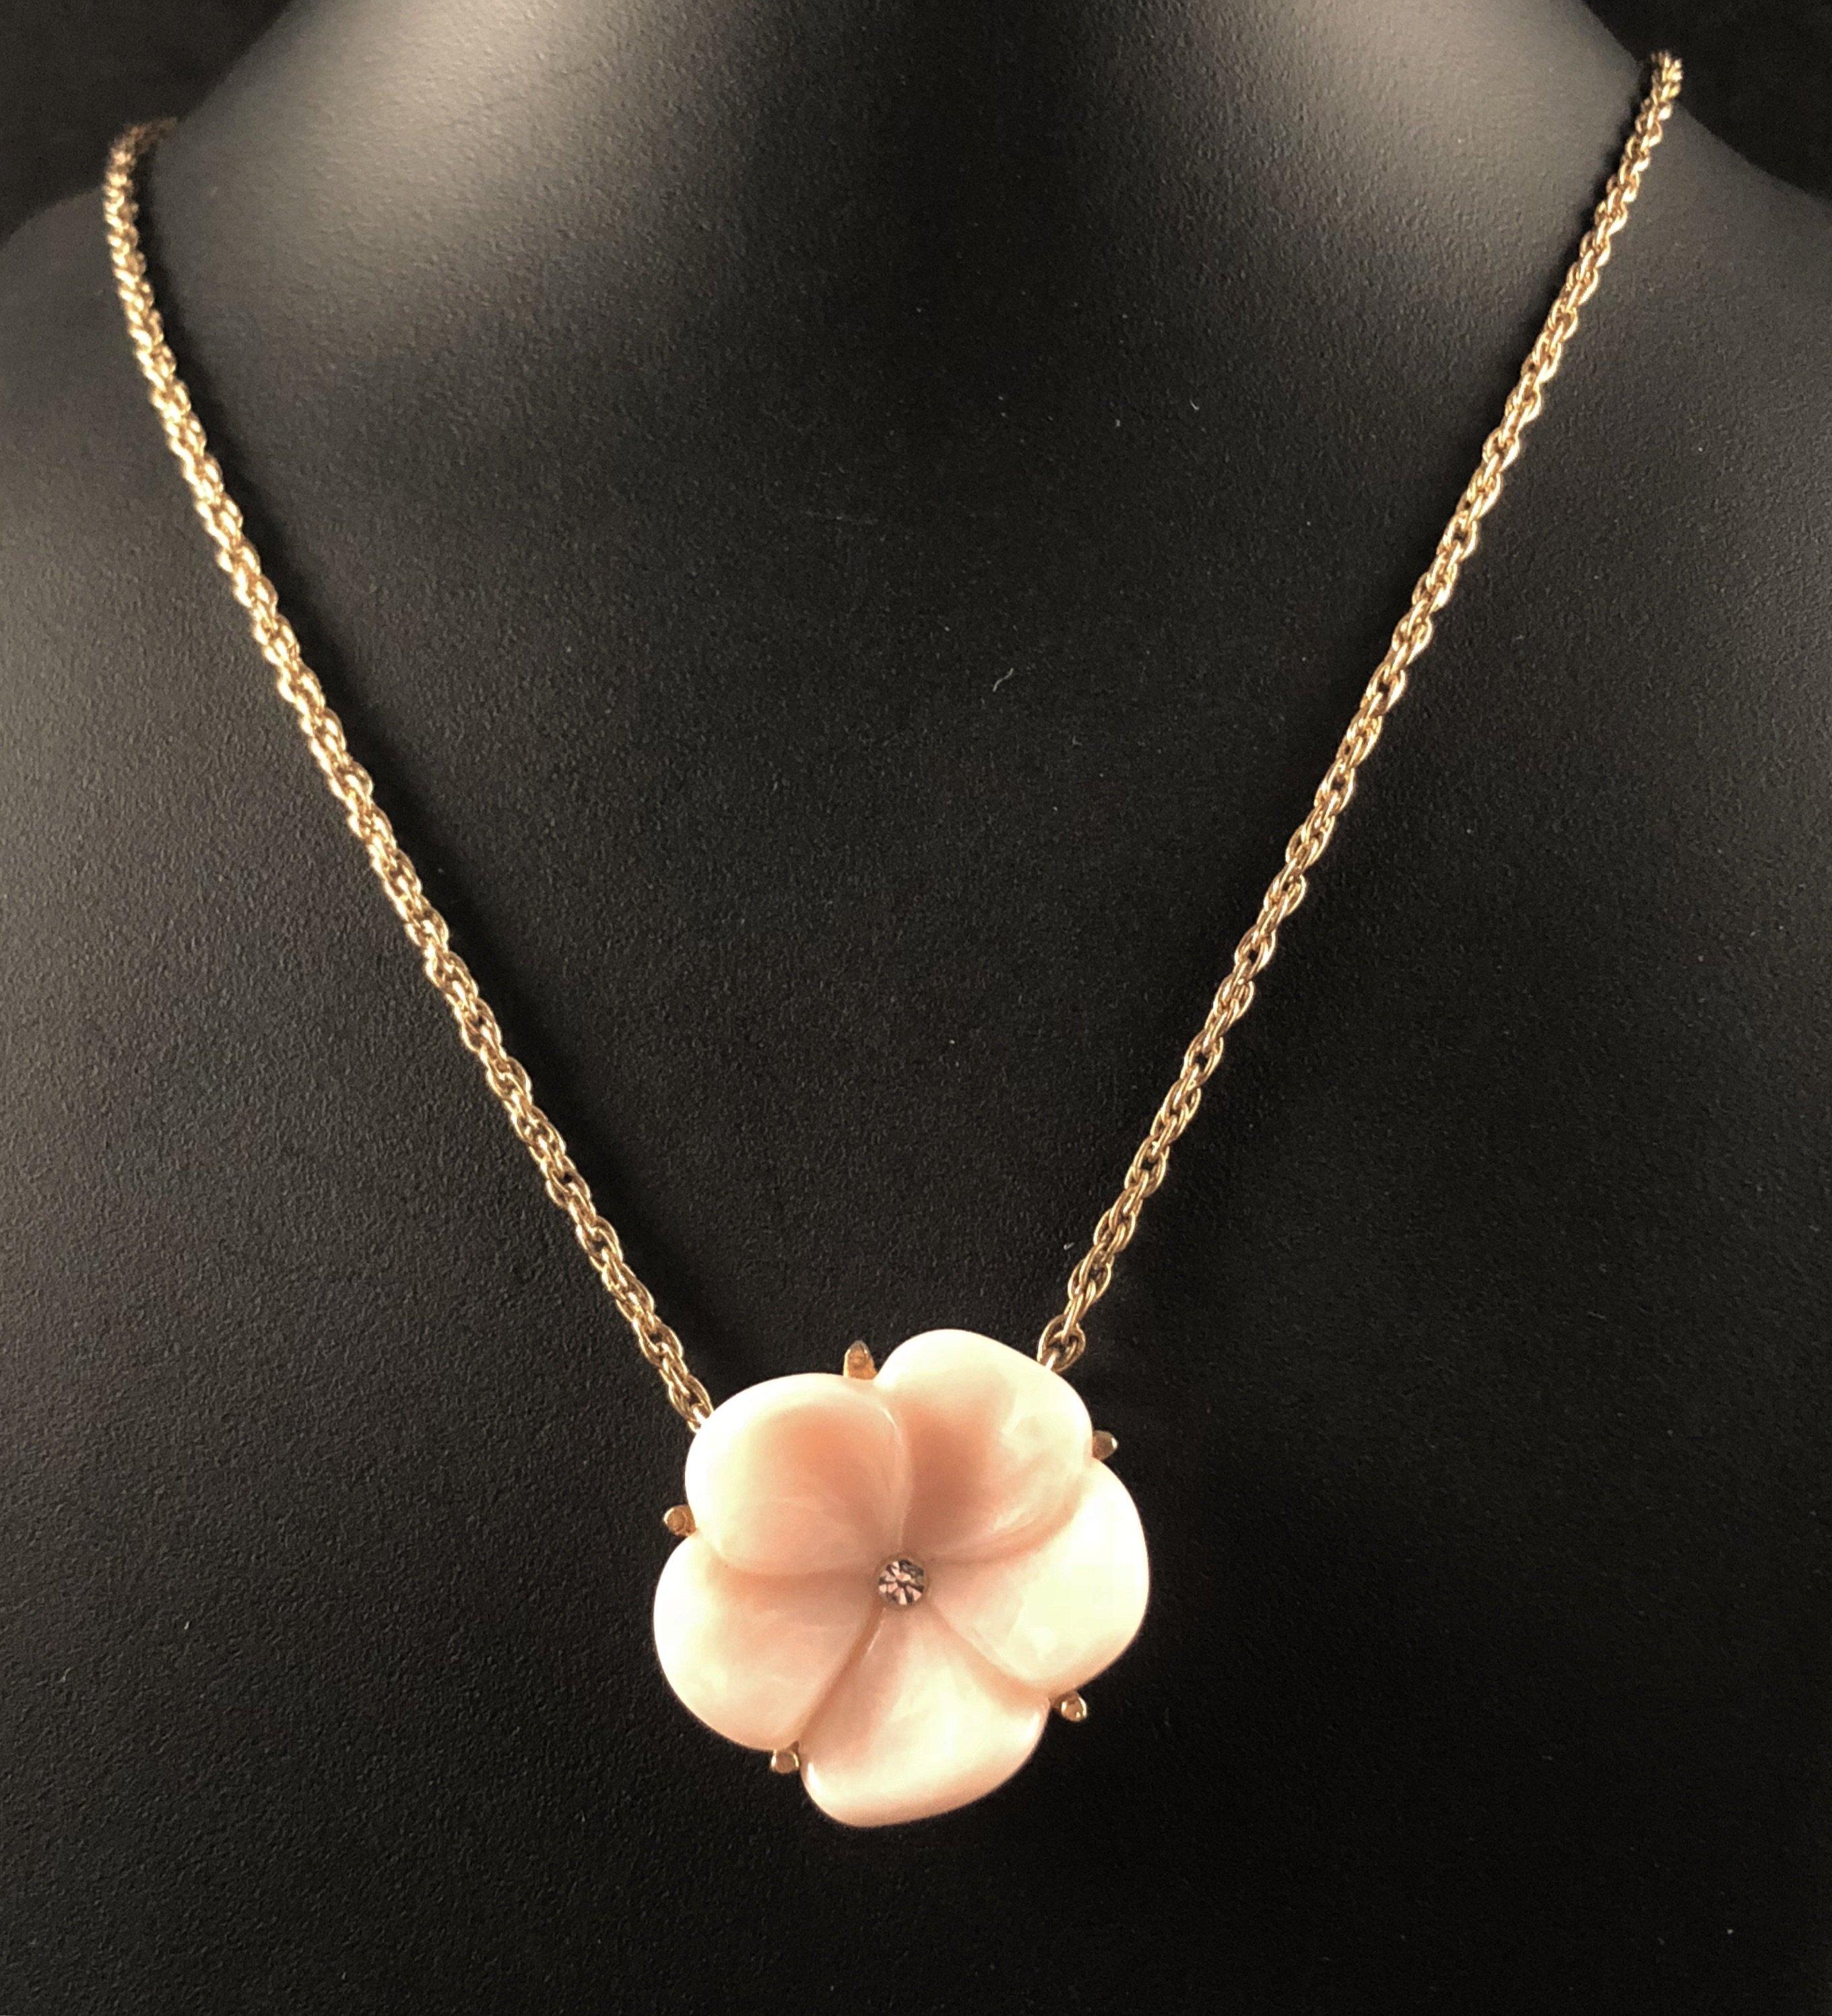 1978 avon lotus blossom necklace in 2020 lotus blossom